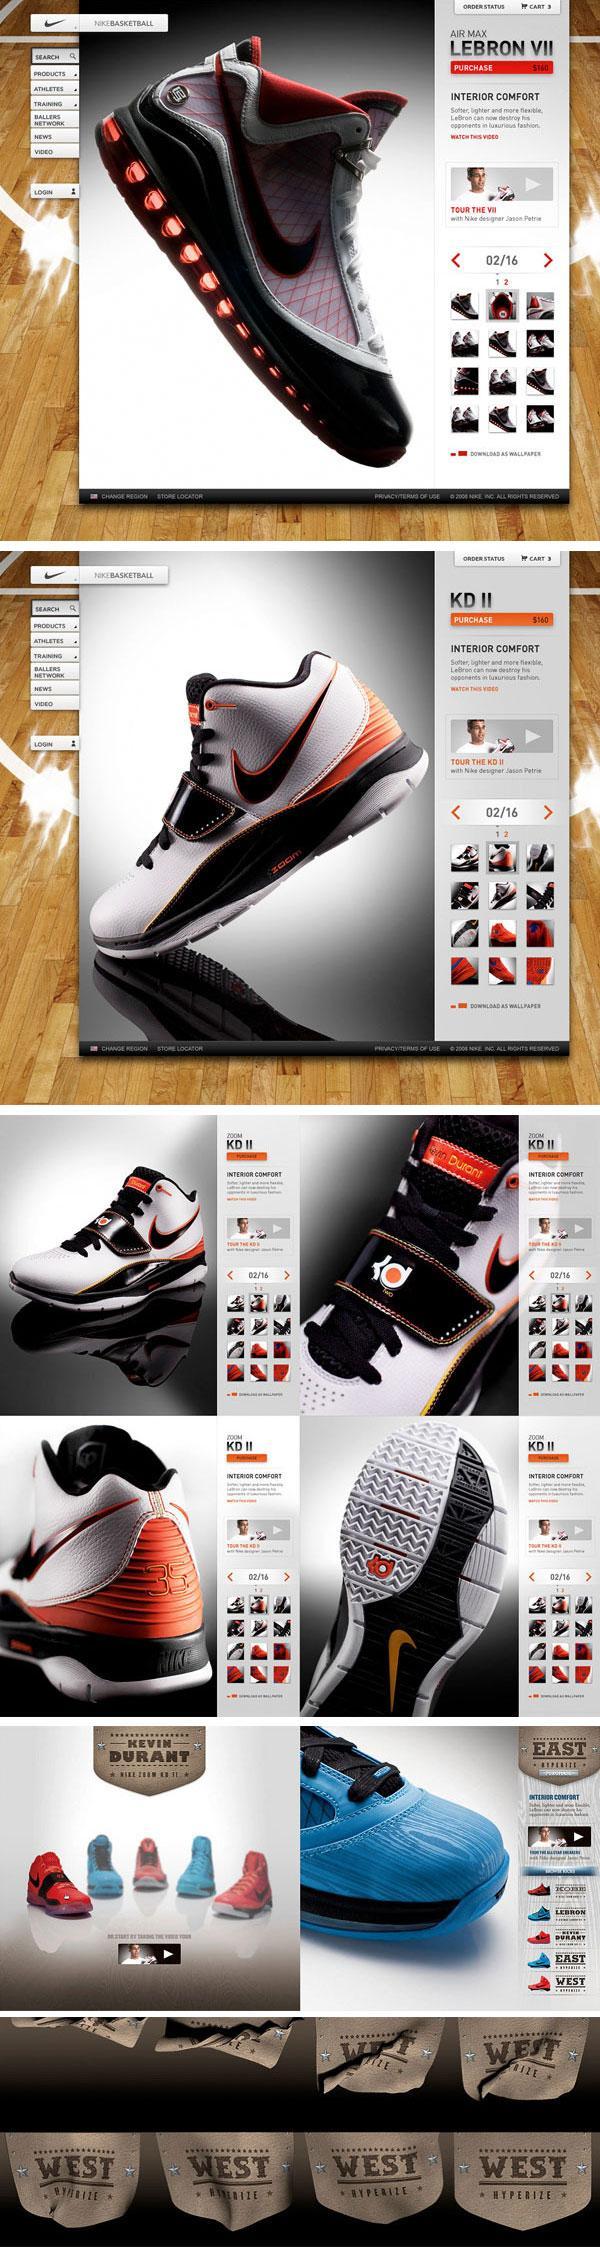 Nike LebronVII | MRG LAB BLOG creative experience